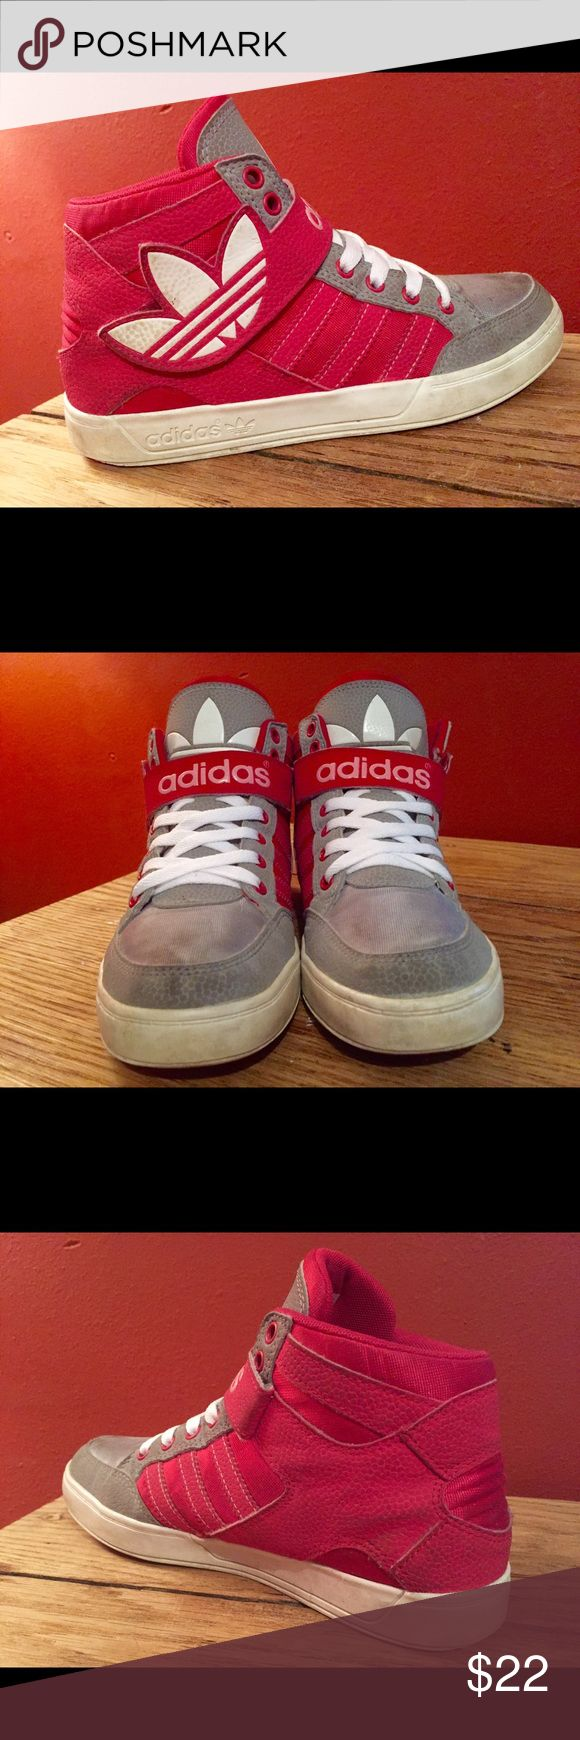 adidas shoes for girls size 135 adidas gazelle pink blog theme